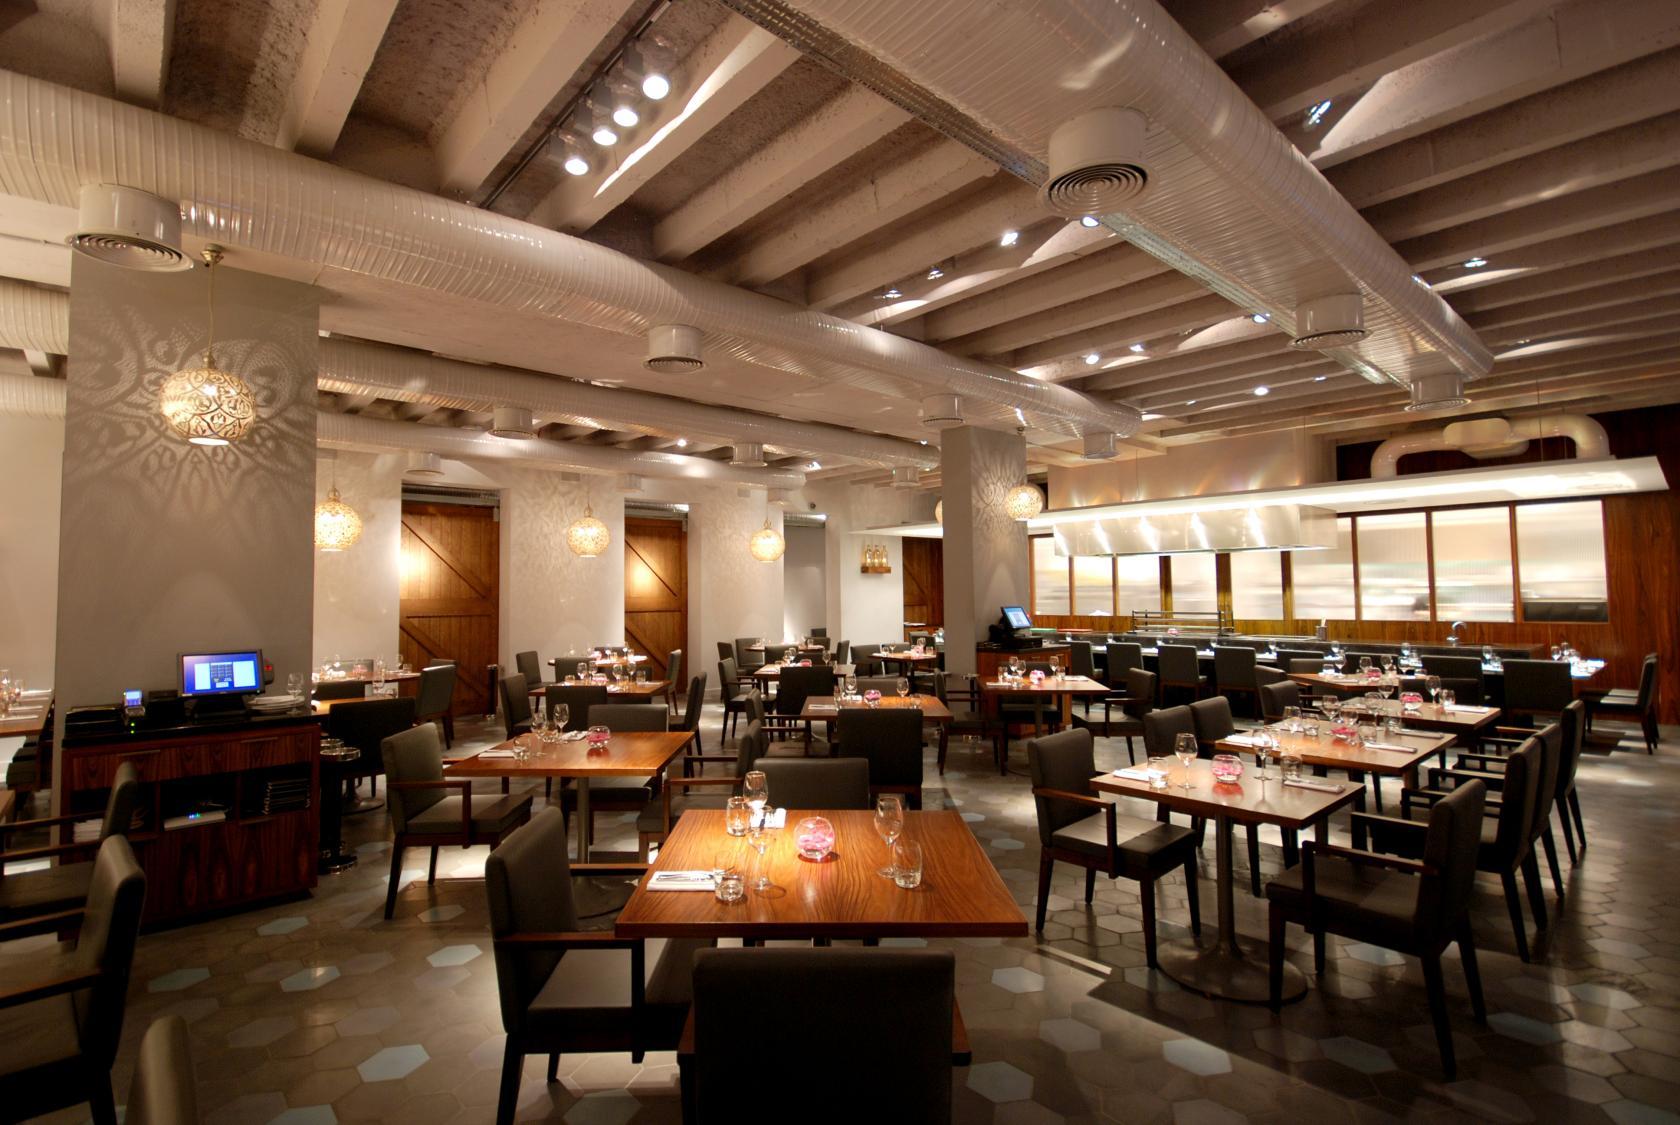 Cinnamon Kitchen  Event Venue Hire  London  Tagvenuecom